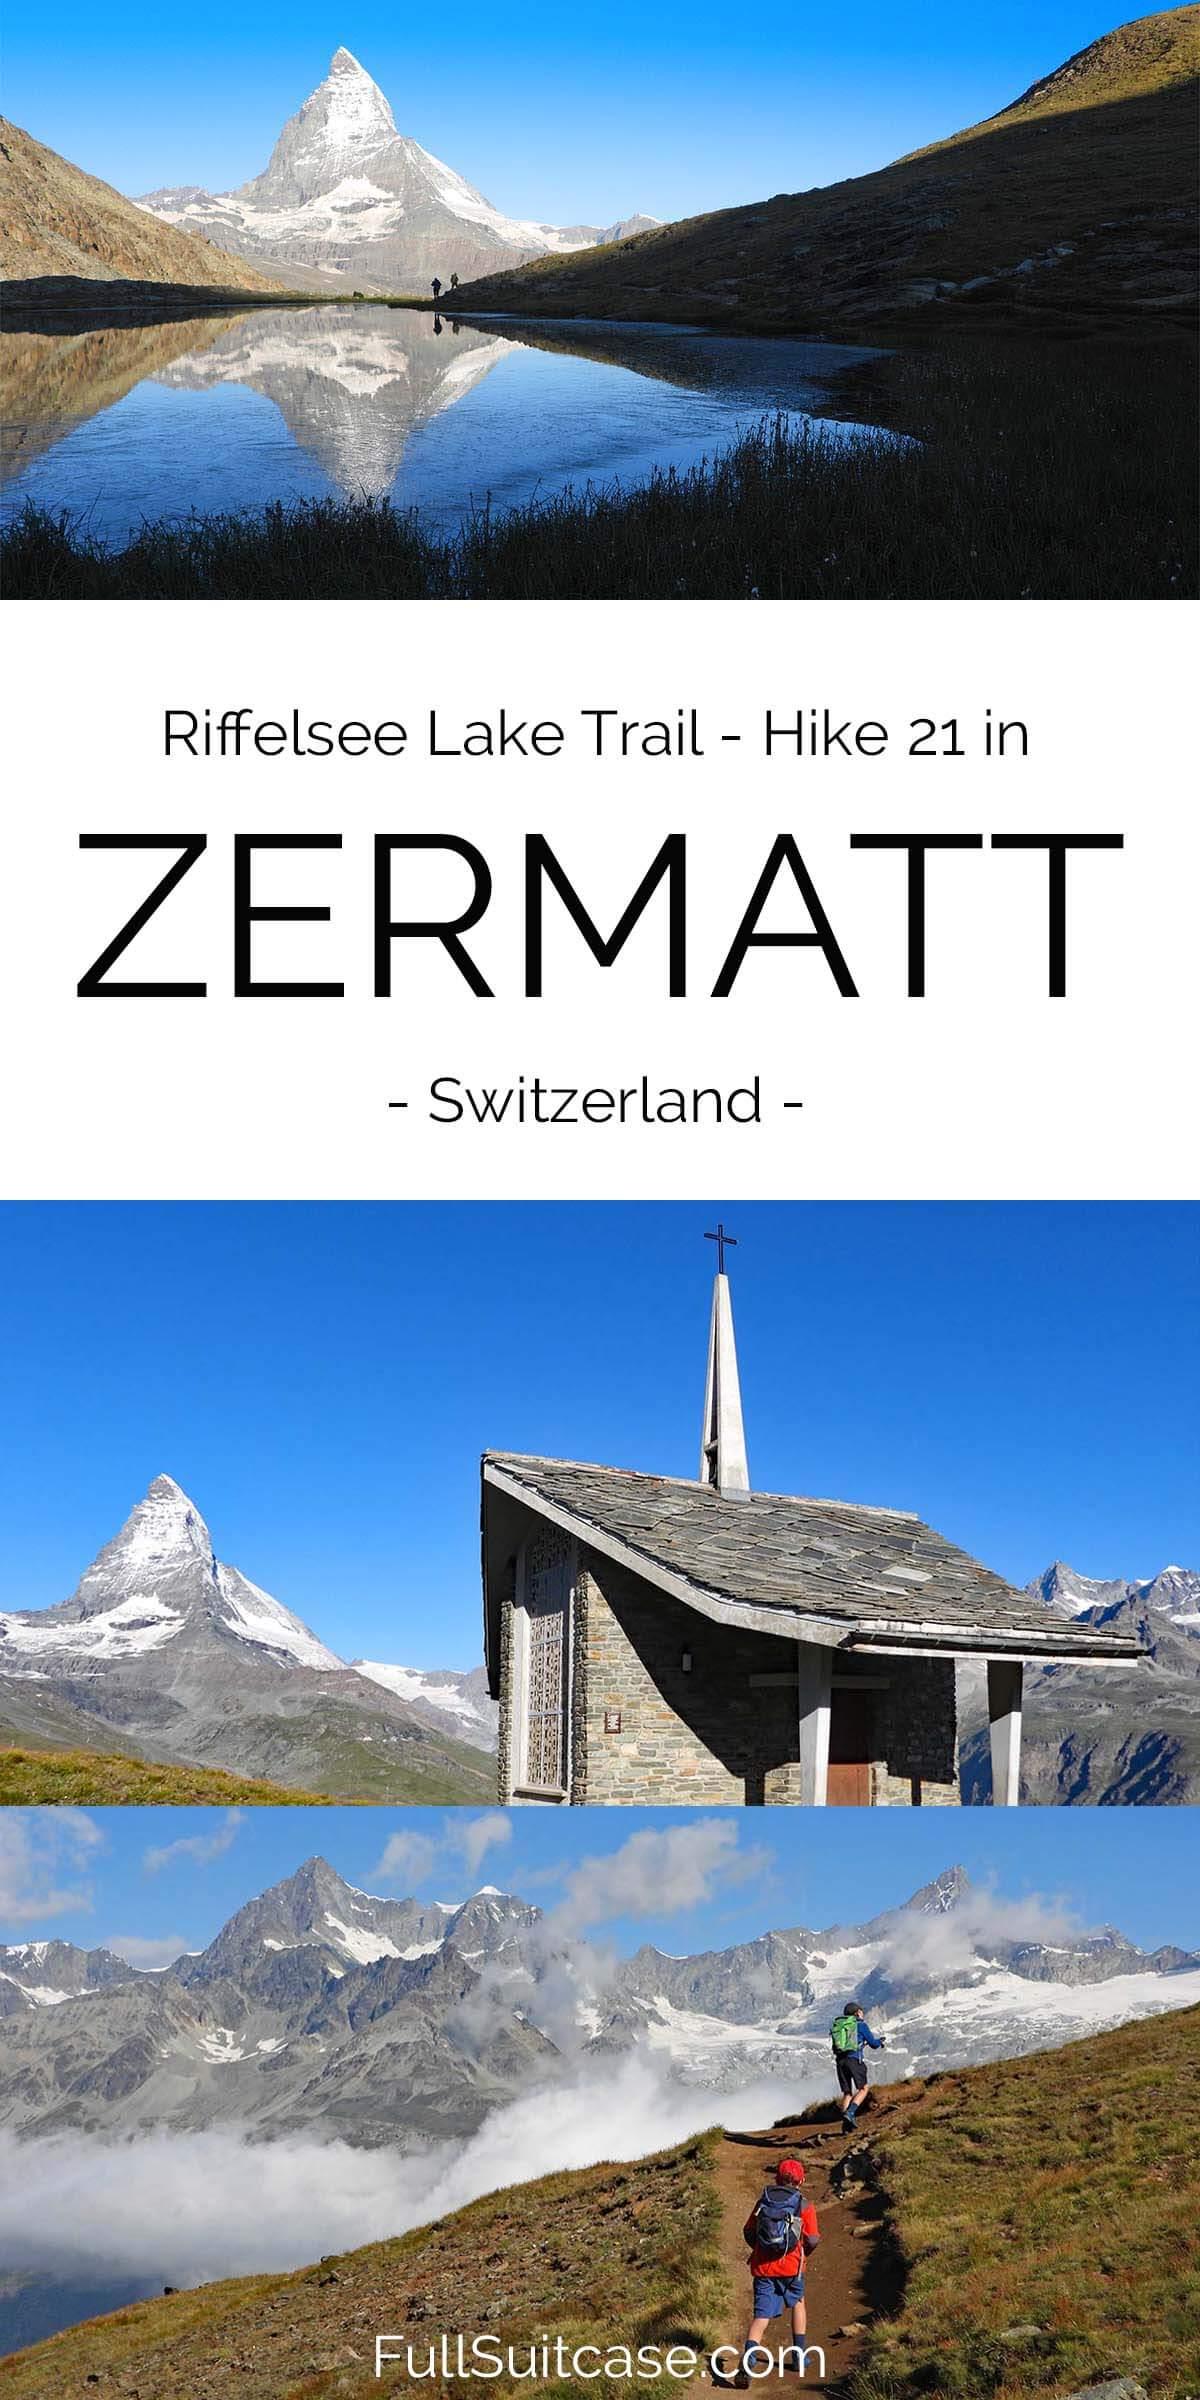 Riffelsee Lake Trail - one of the best easy hikes in Zermatt, Switzerland